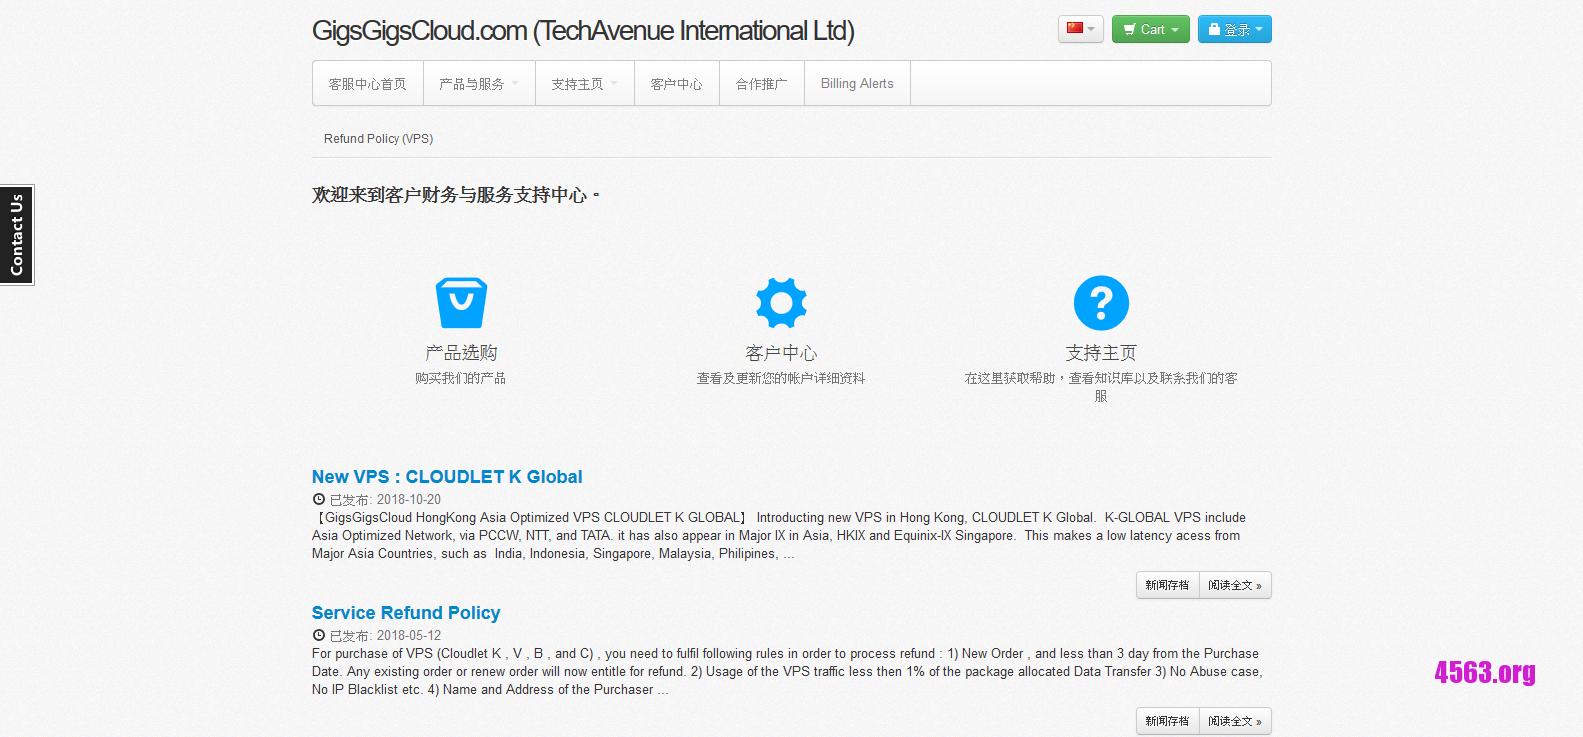 GigsGigsCloud:$10/月/500MB内存/20GB SSD空间/1TB流量/KVM/香港/三网直连